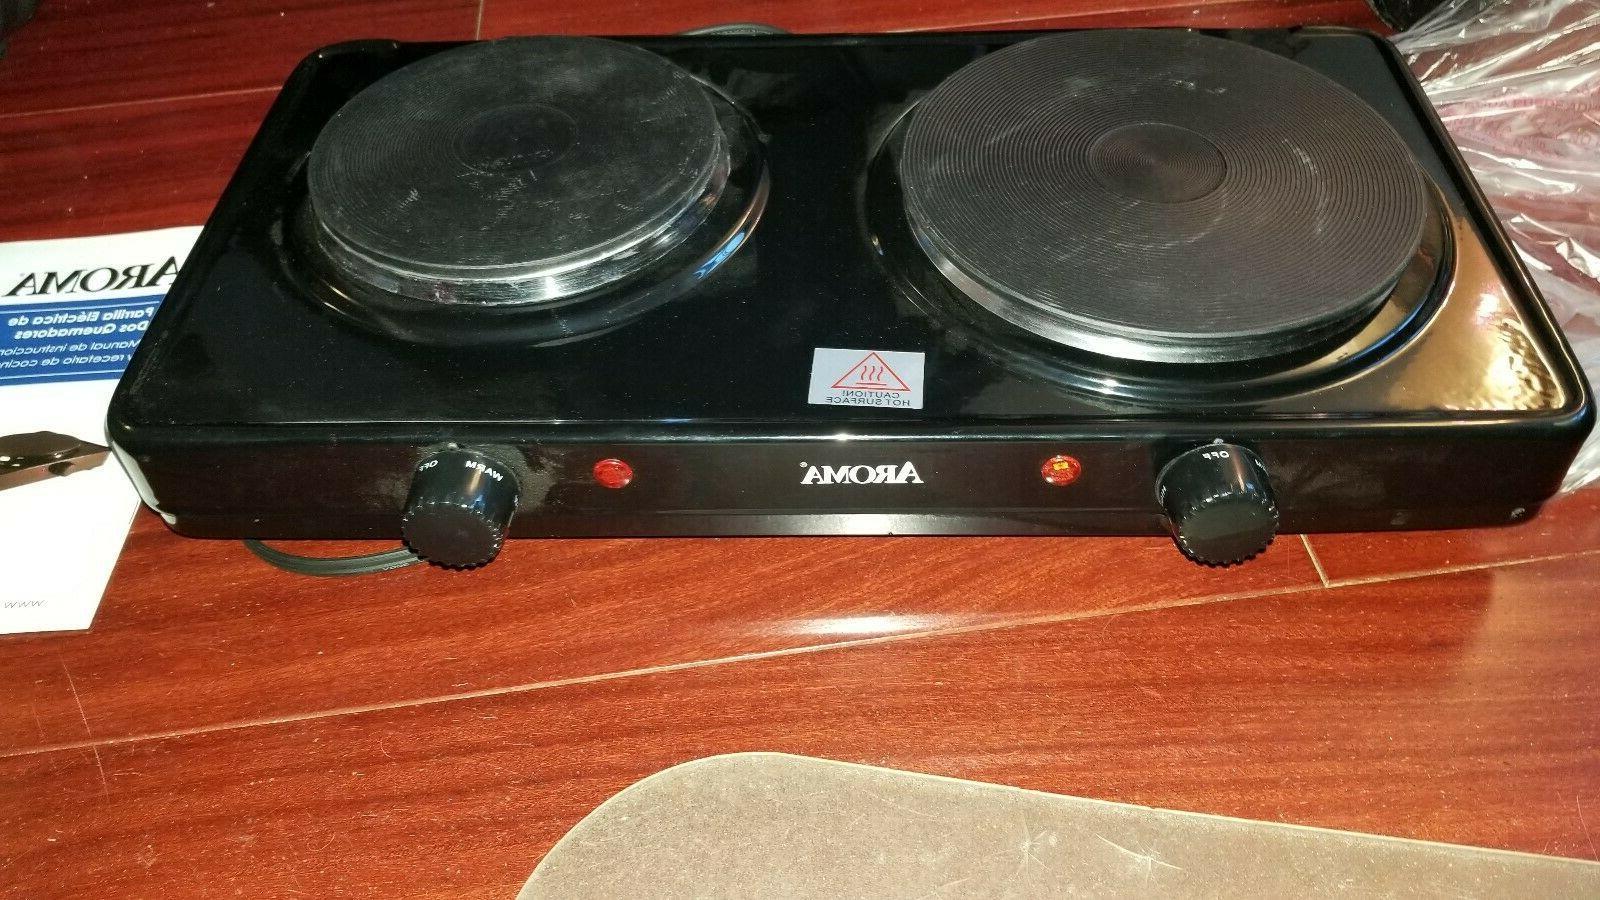 AROMA Double Diecast Hot Plate Range Temperature Control Black